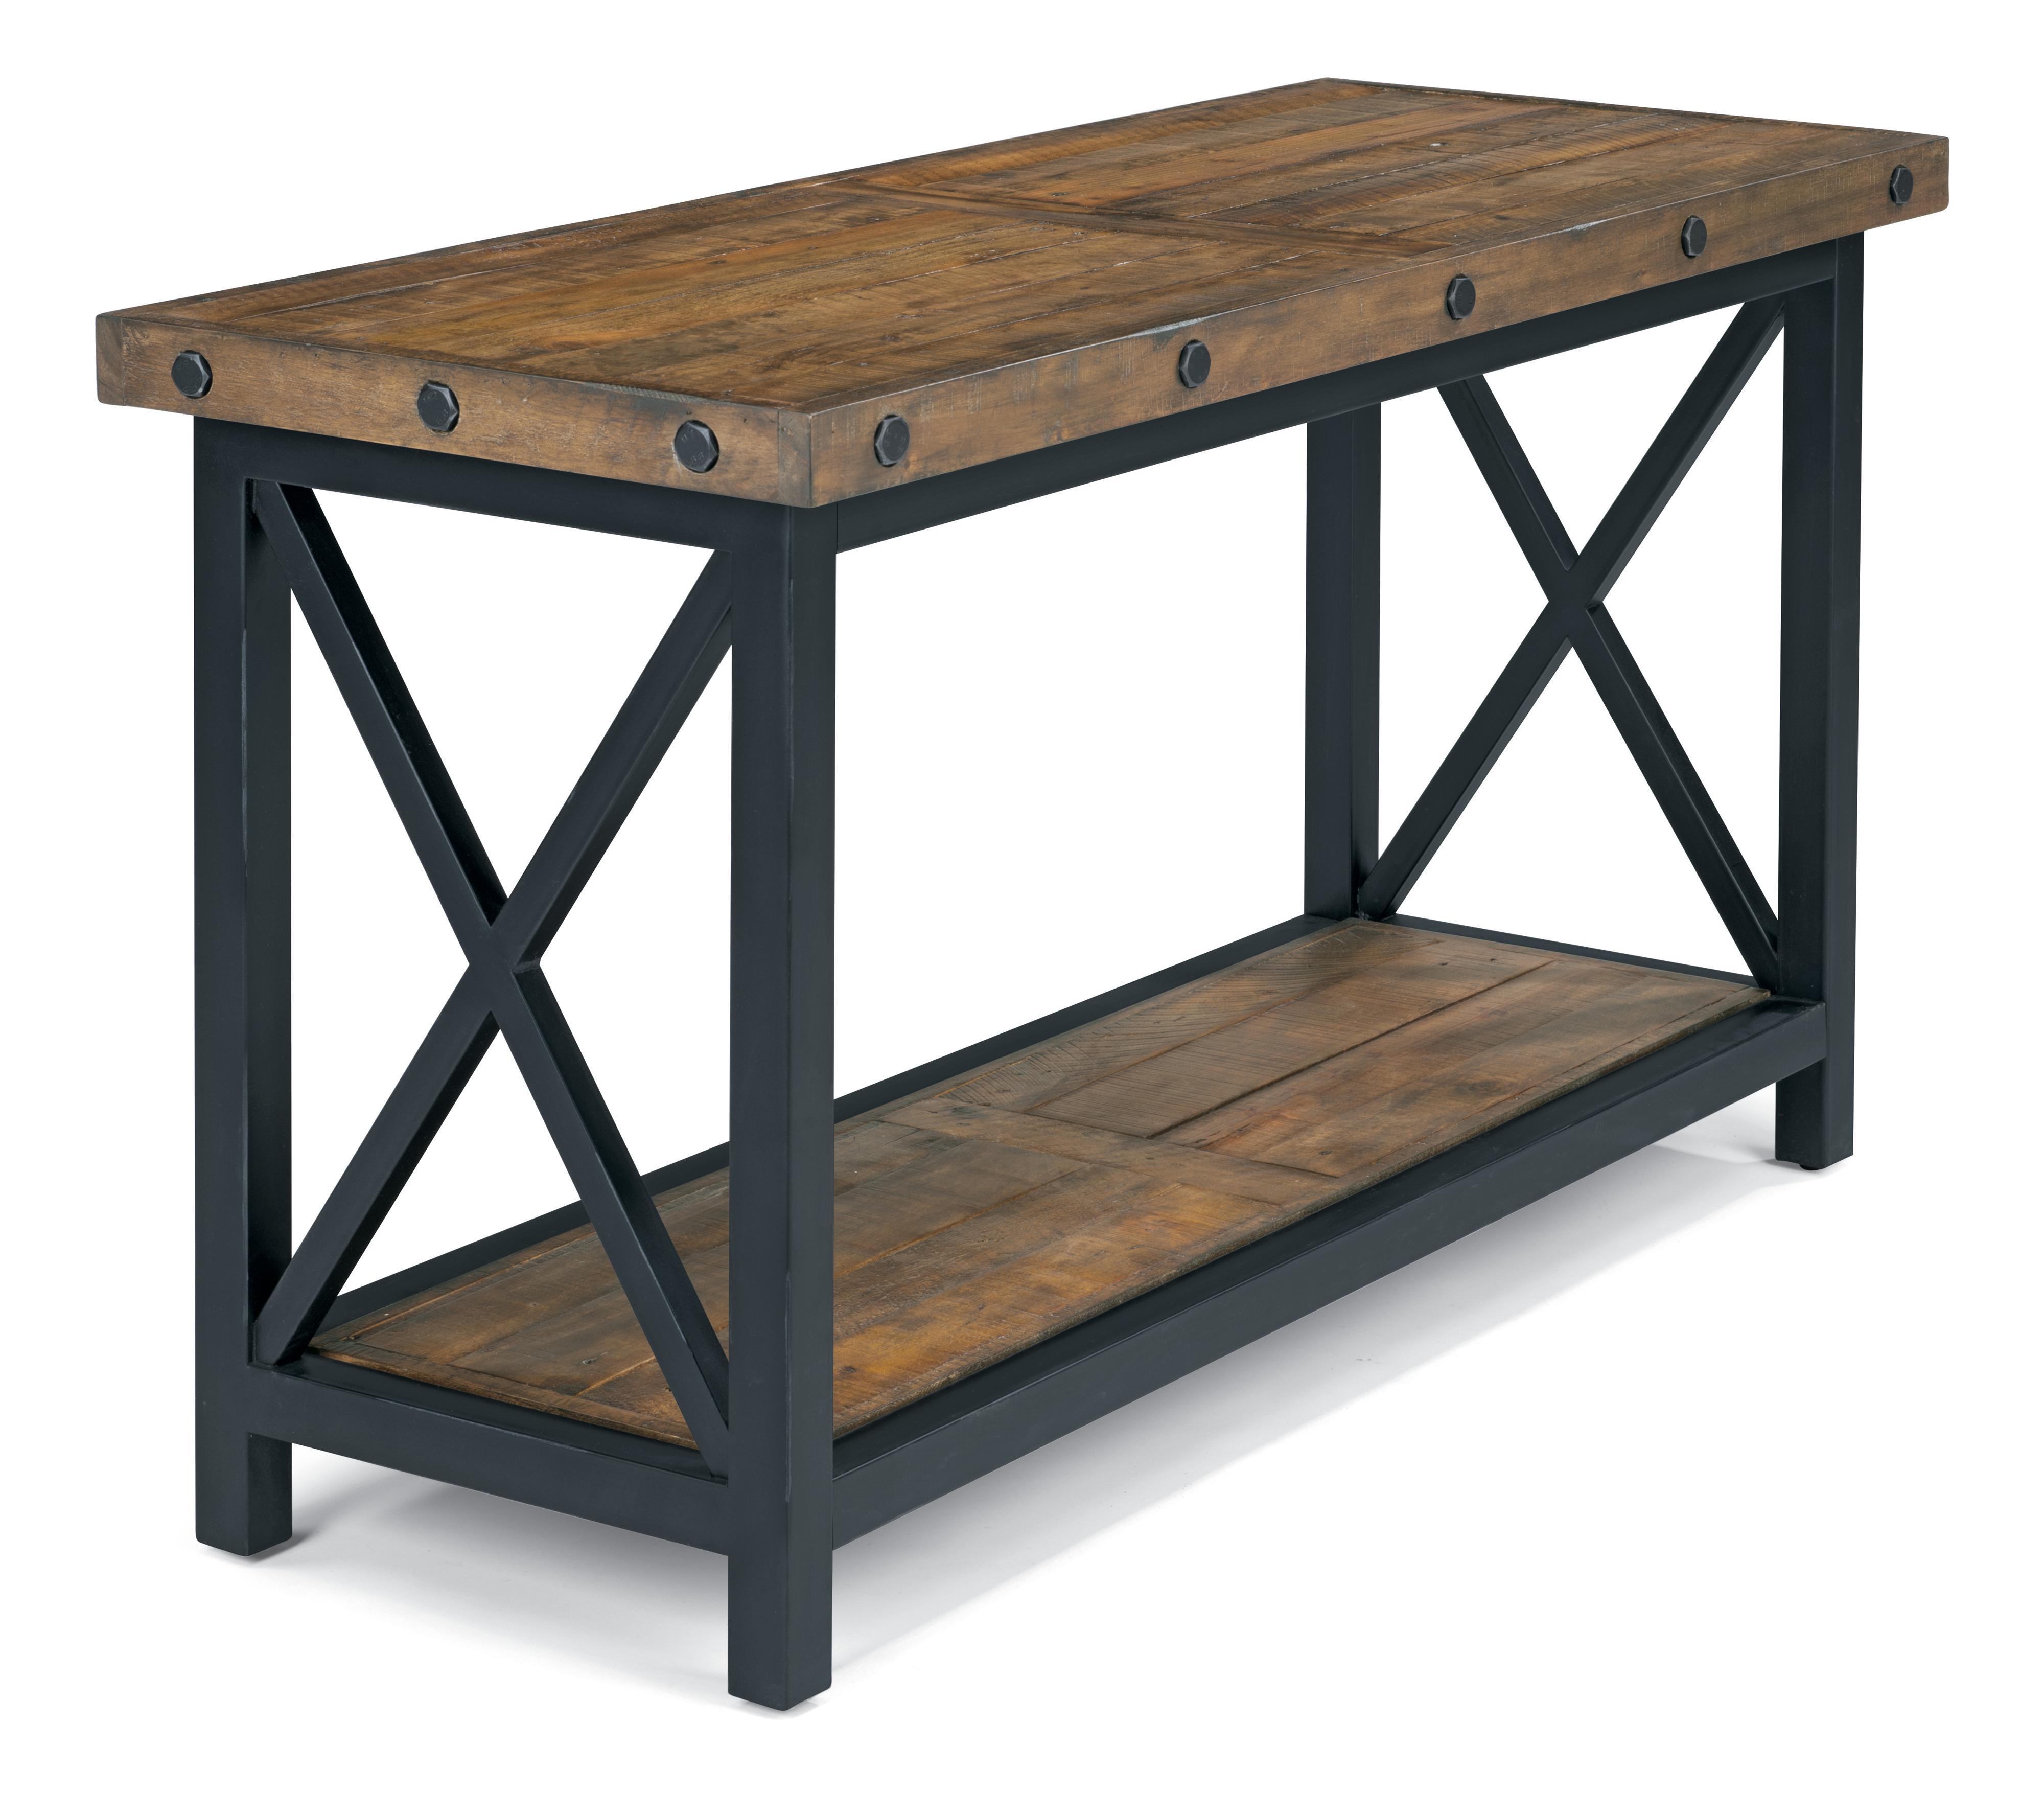 Hammermill Sofa Table by Flexsteel at Crowley Furniture & Mattress